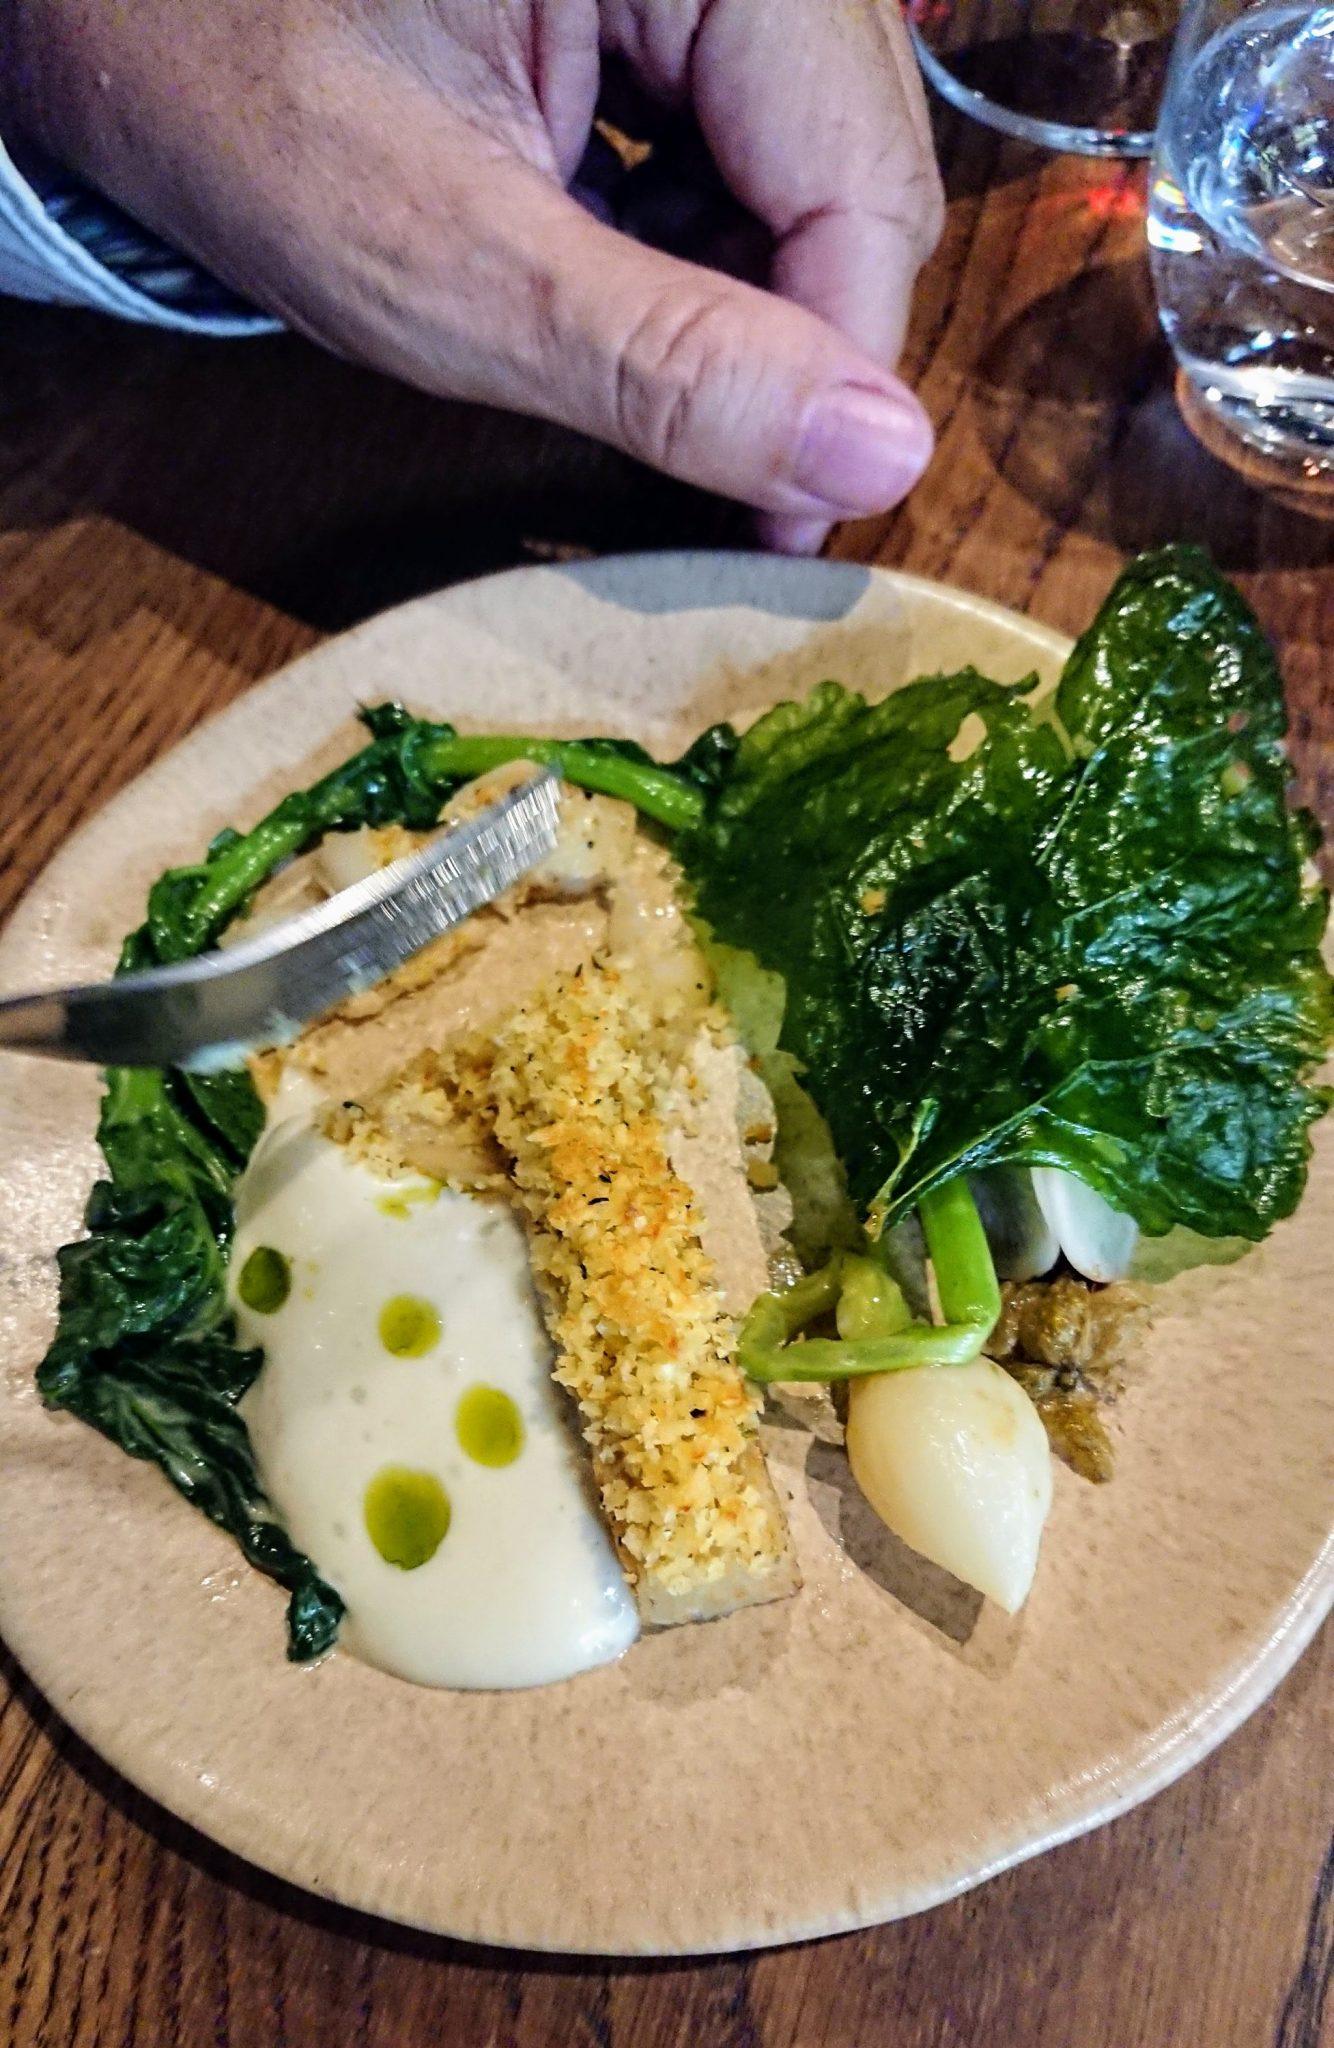 turnip gratin foxcroft sonia cabano blog eatdrinkcapetown